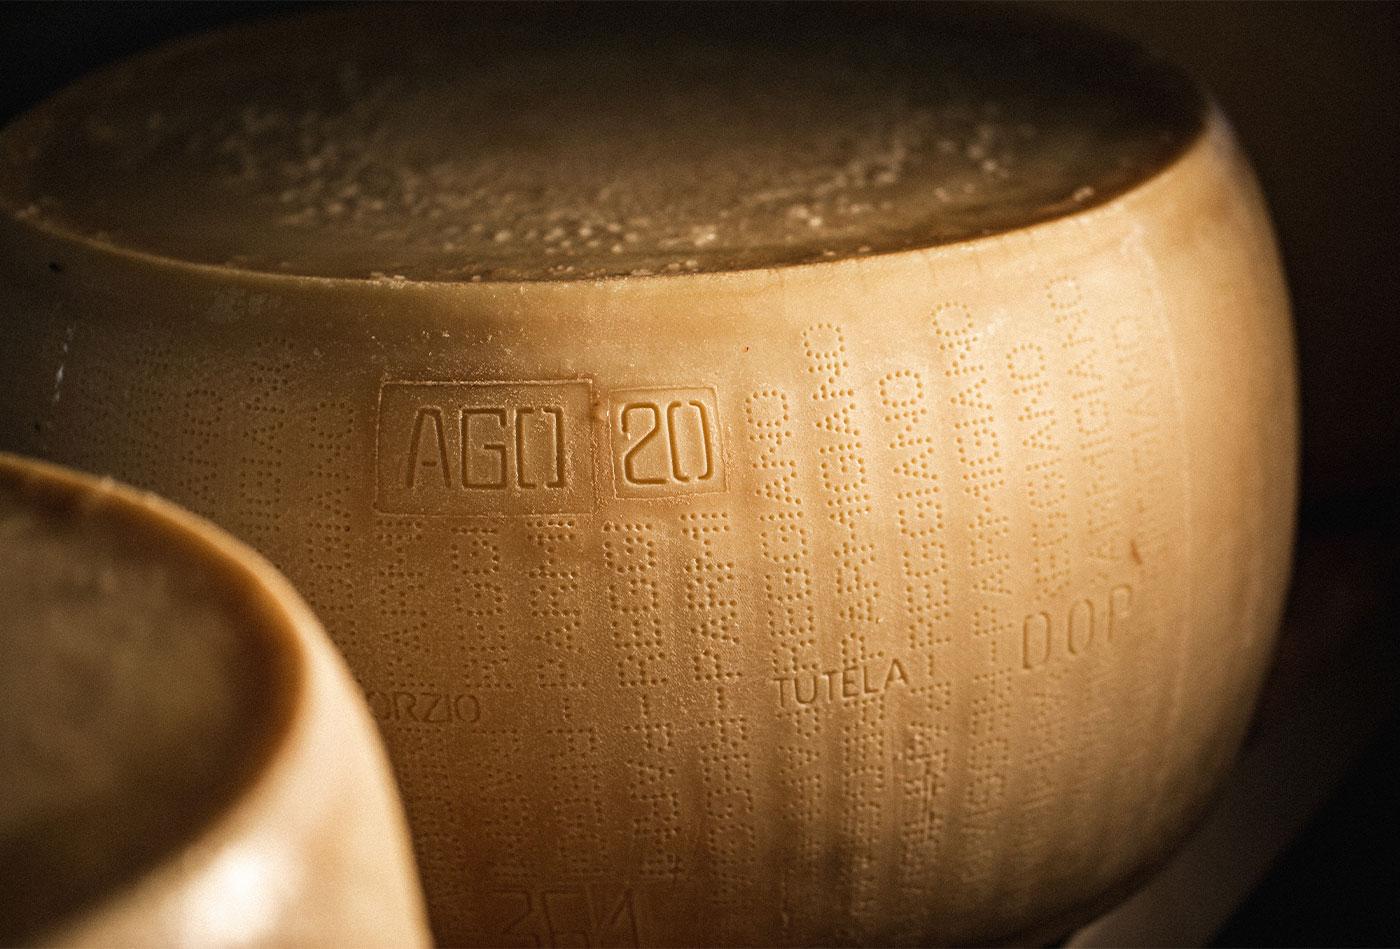 ingredienti del parmigiano reggiano